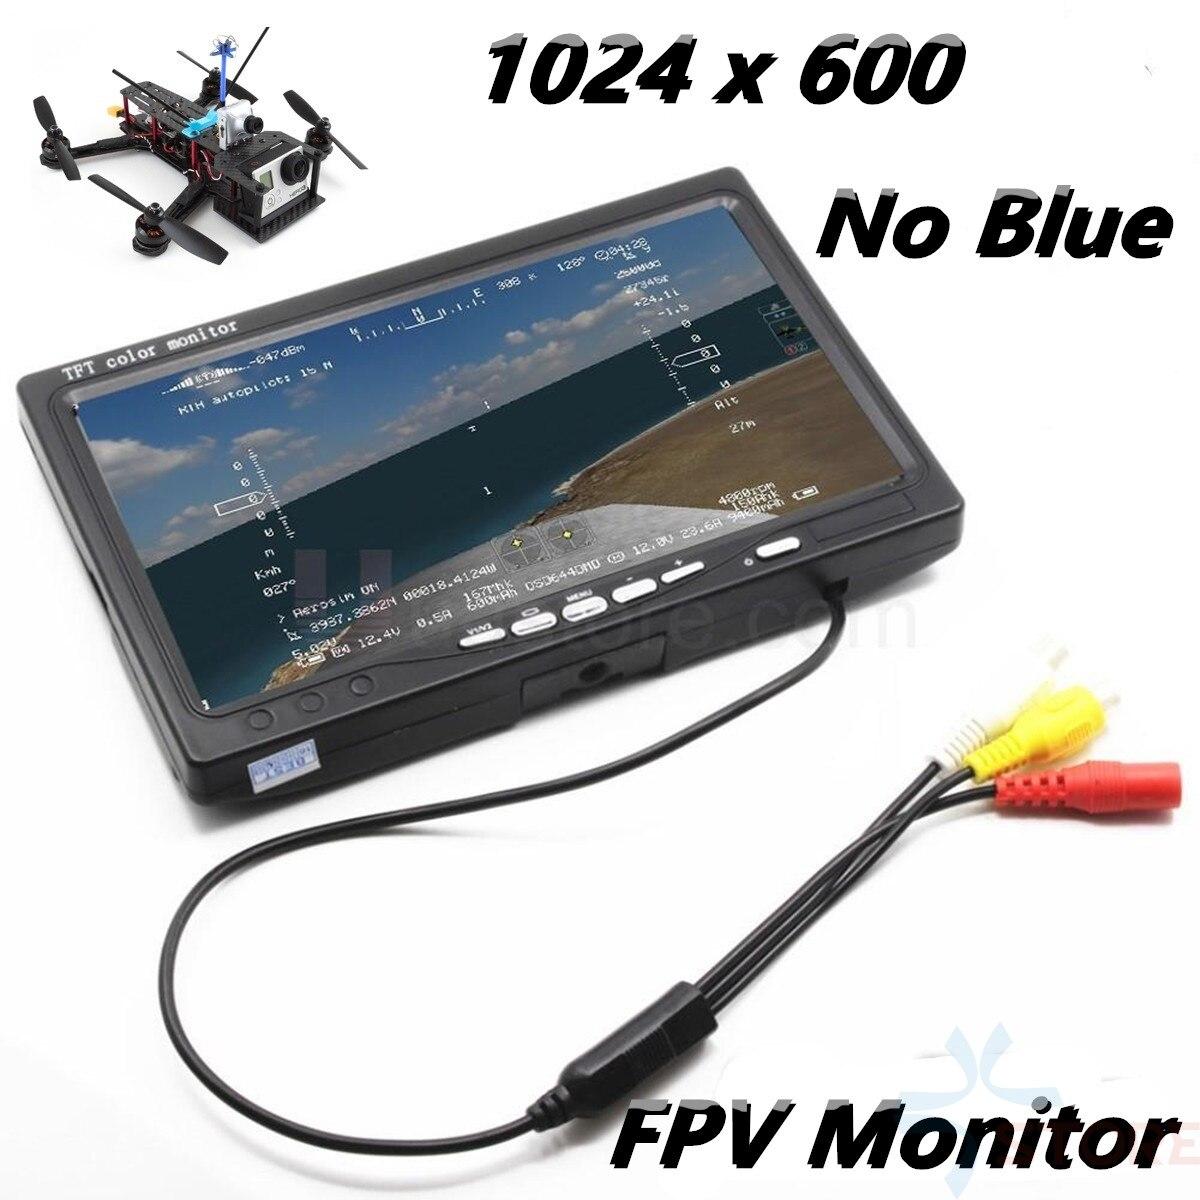 7 pulgadas TFT LCD Monitor FPV 1024x600 w/T enchufe pantalla No azul Monitor FPV fotografía estación fantasma RC MODELO DE QAV250